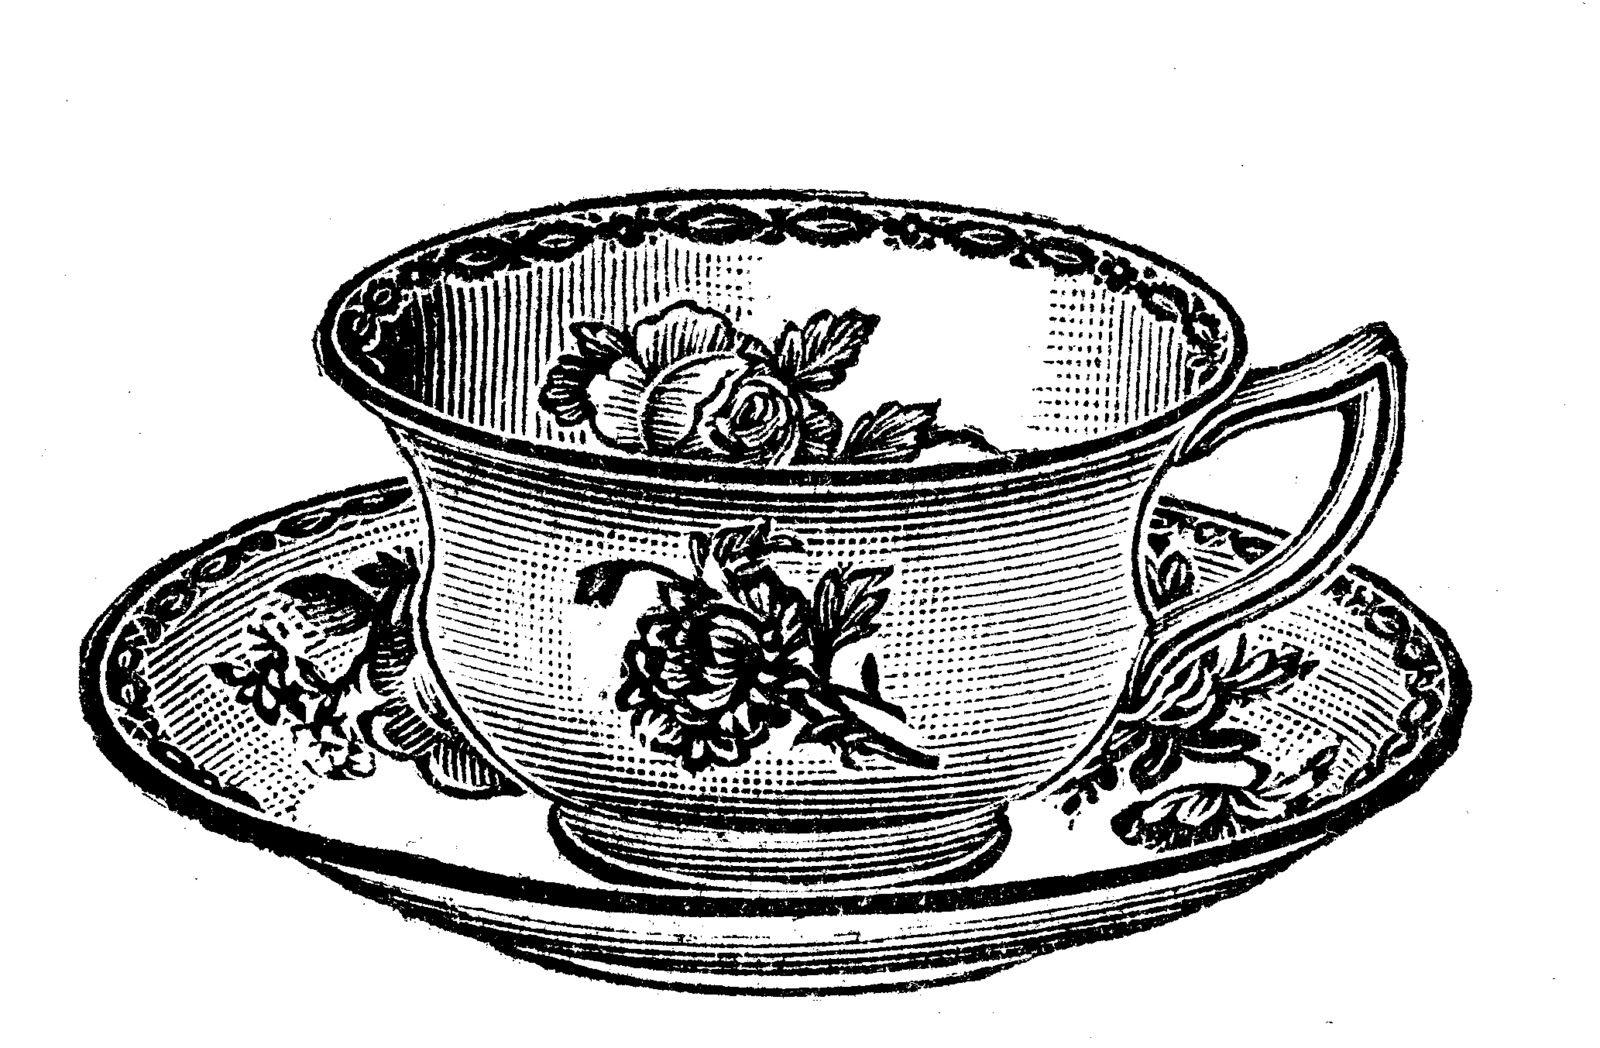 Free vintage clip art images: Vintage tea party crockery ….